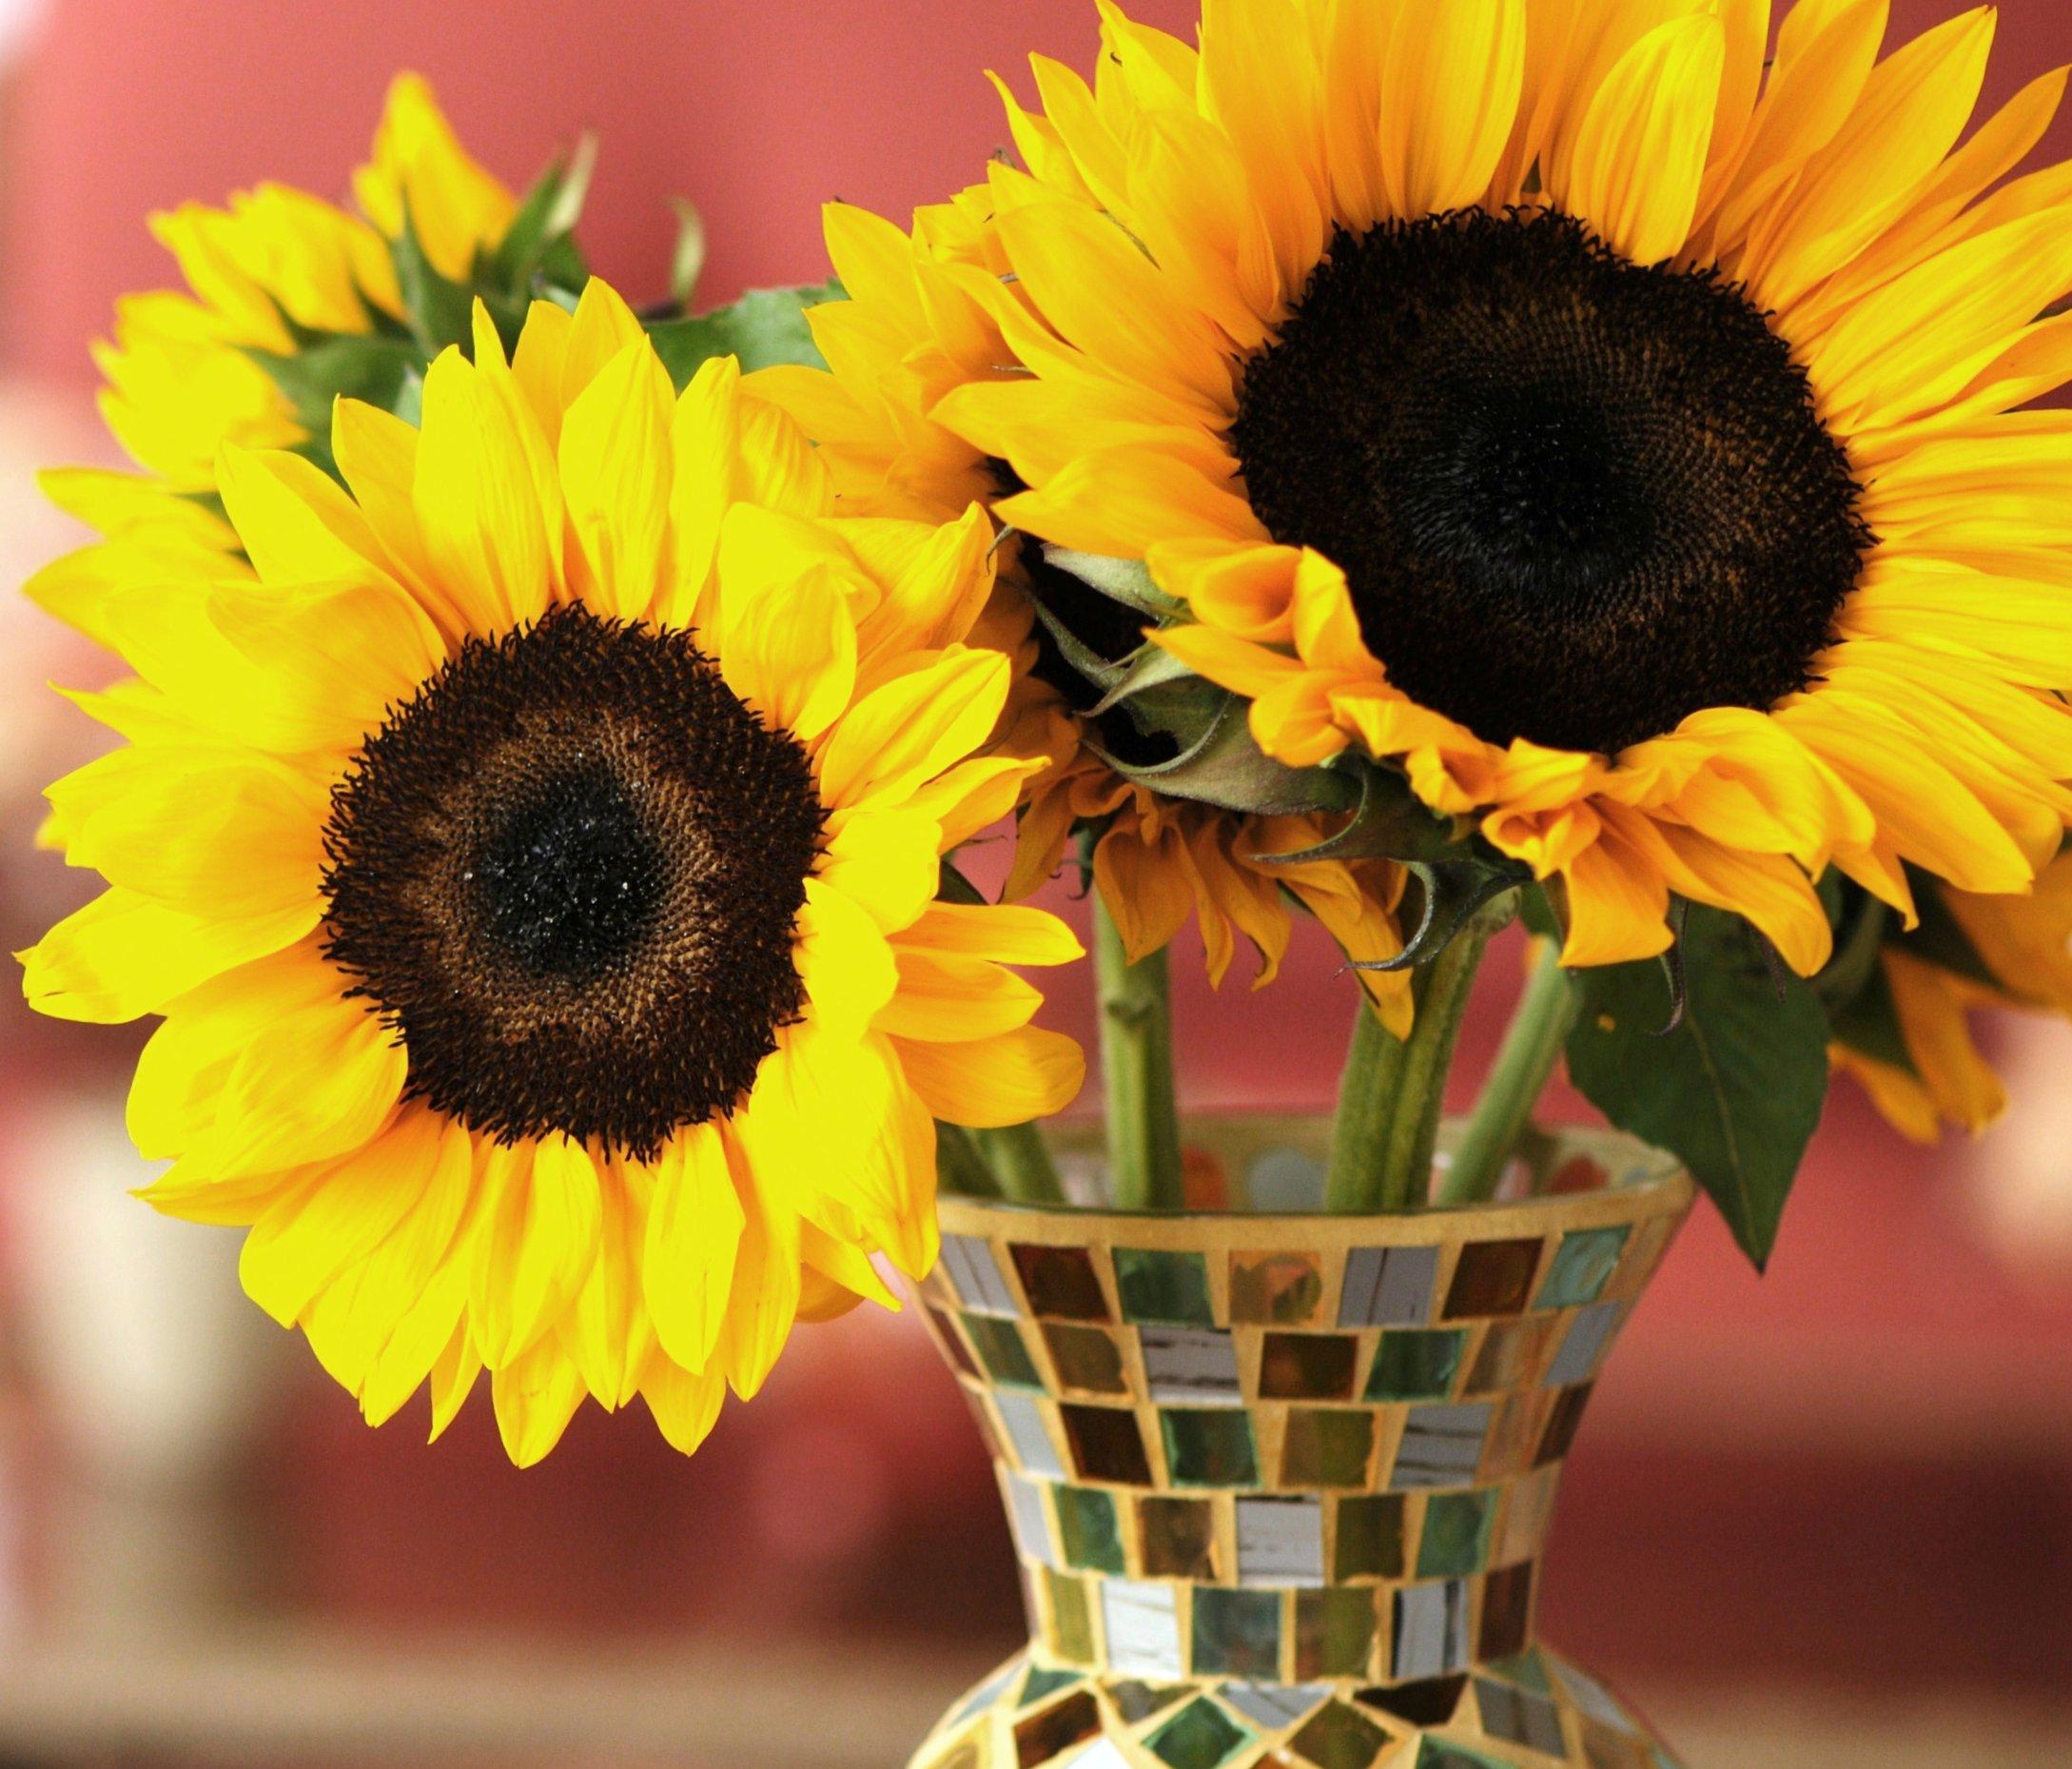 вот кто фото картинки цветы подсолнухи в вазах примерно